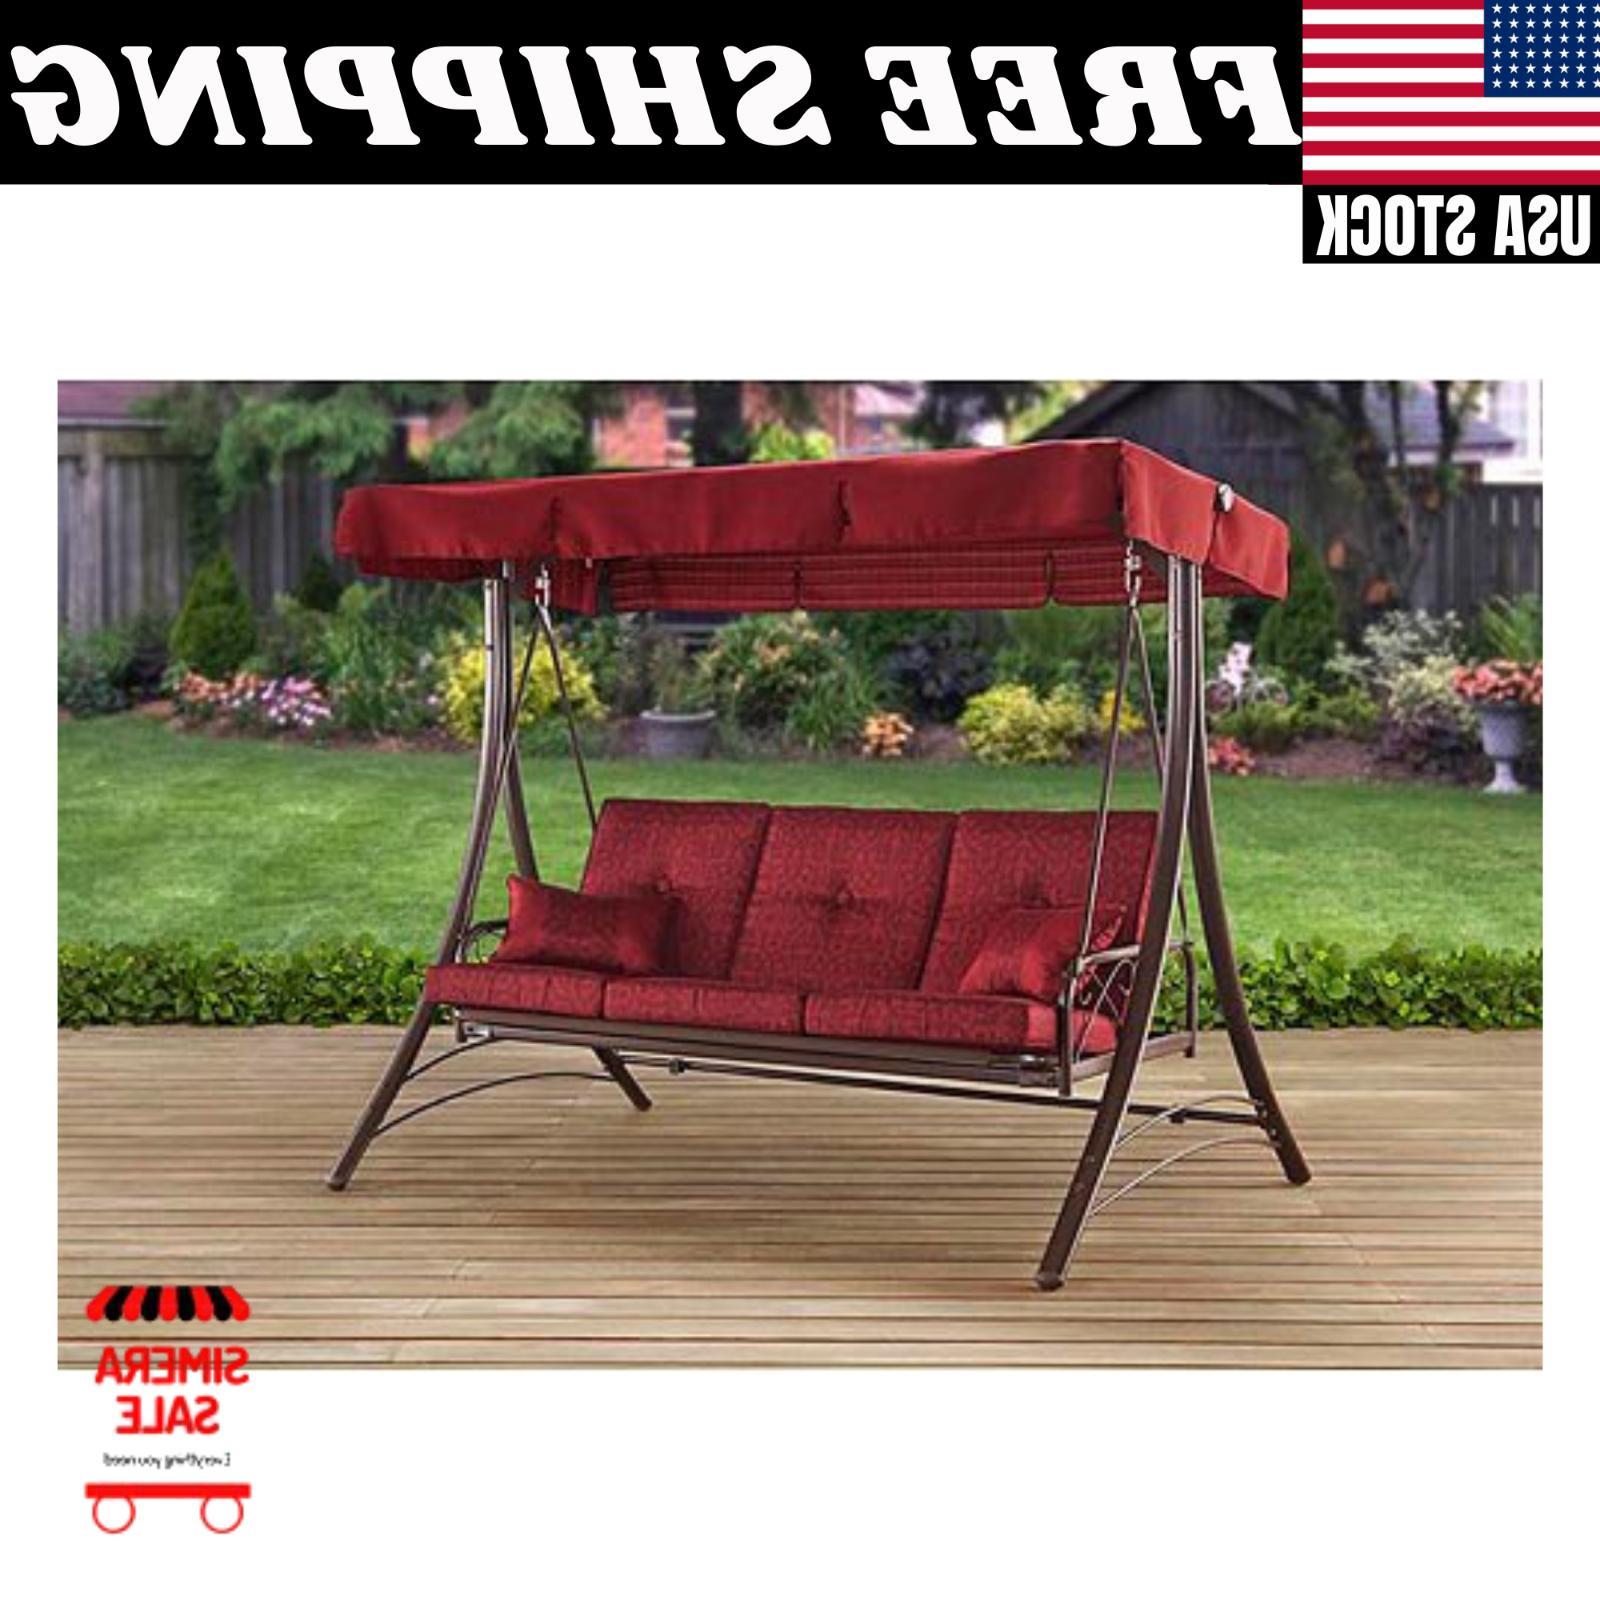 callimont park 3 seat adjustable canopy recliner